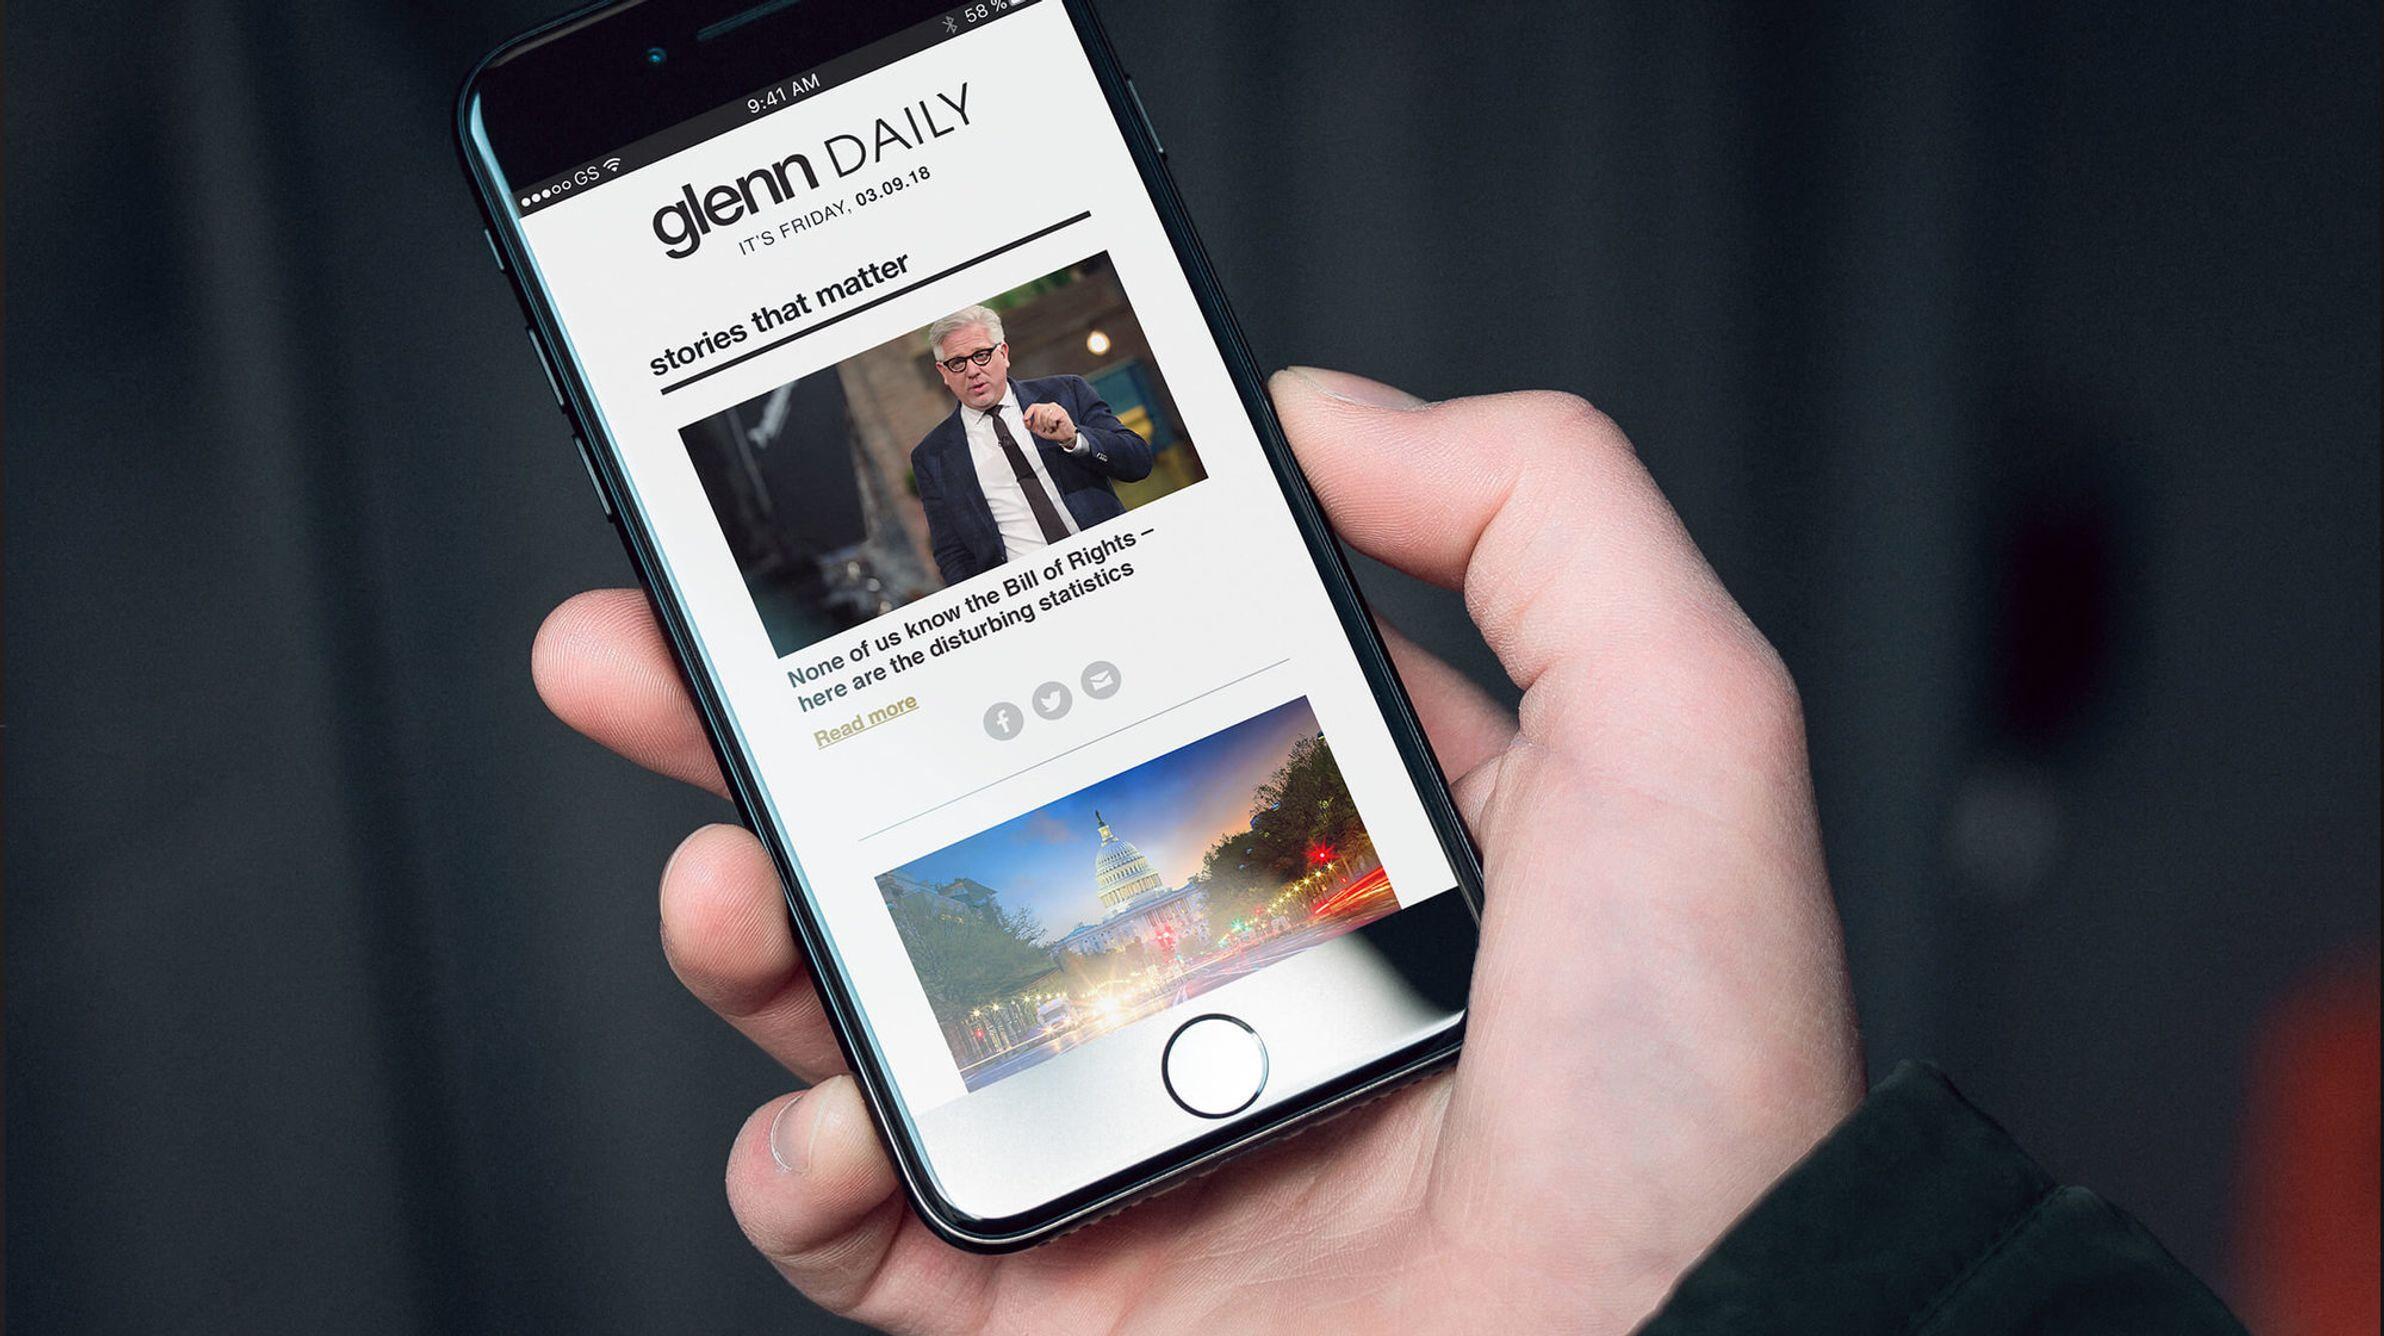 Glenn Daily